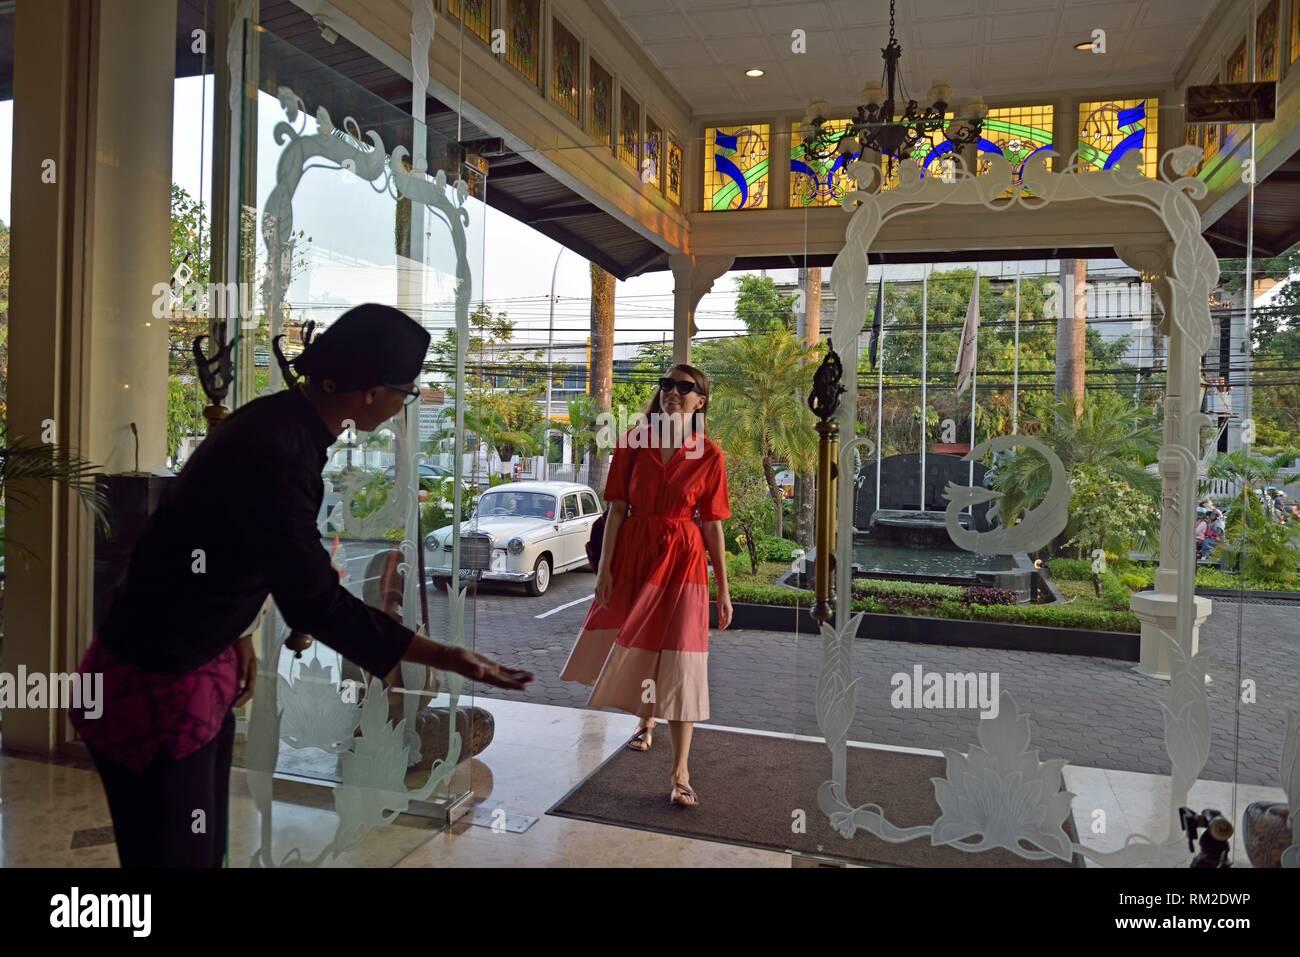 Entrance Of The Luxury Phoenix Hotel Yogyakarta Mgallery By Sofitel Yogyakarta Java Island Indonesia Southeast Asia Stock Photo Alamy